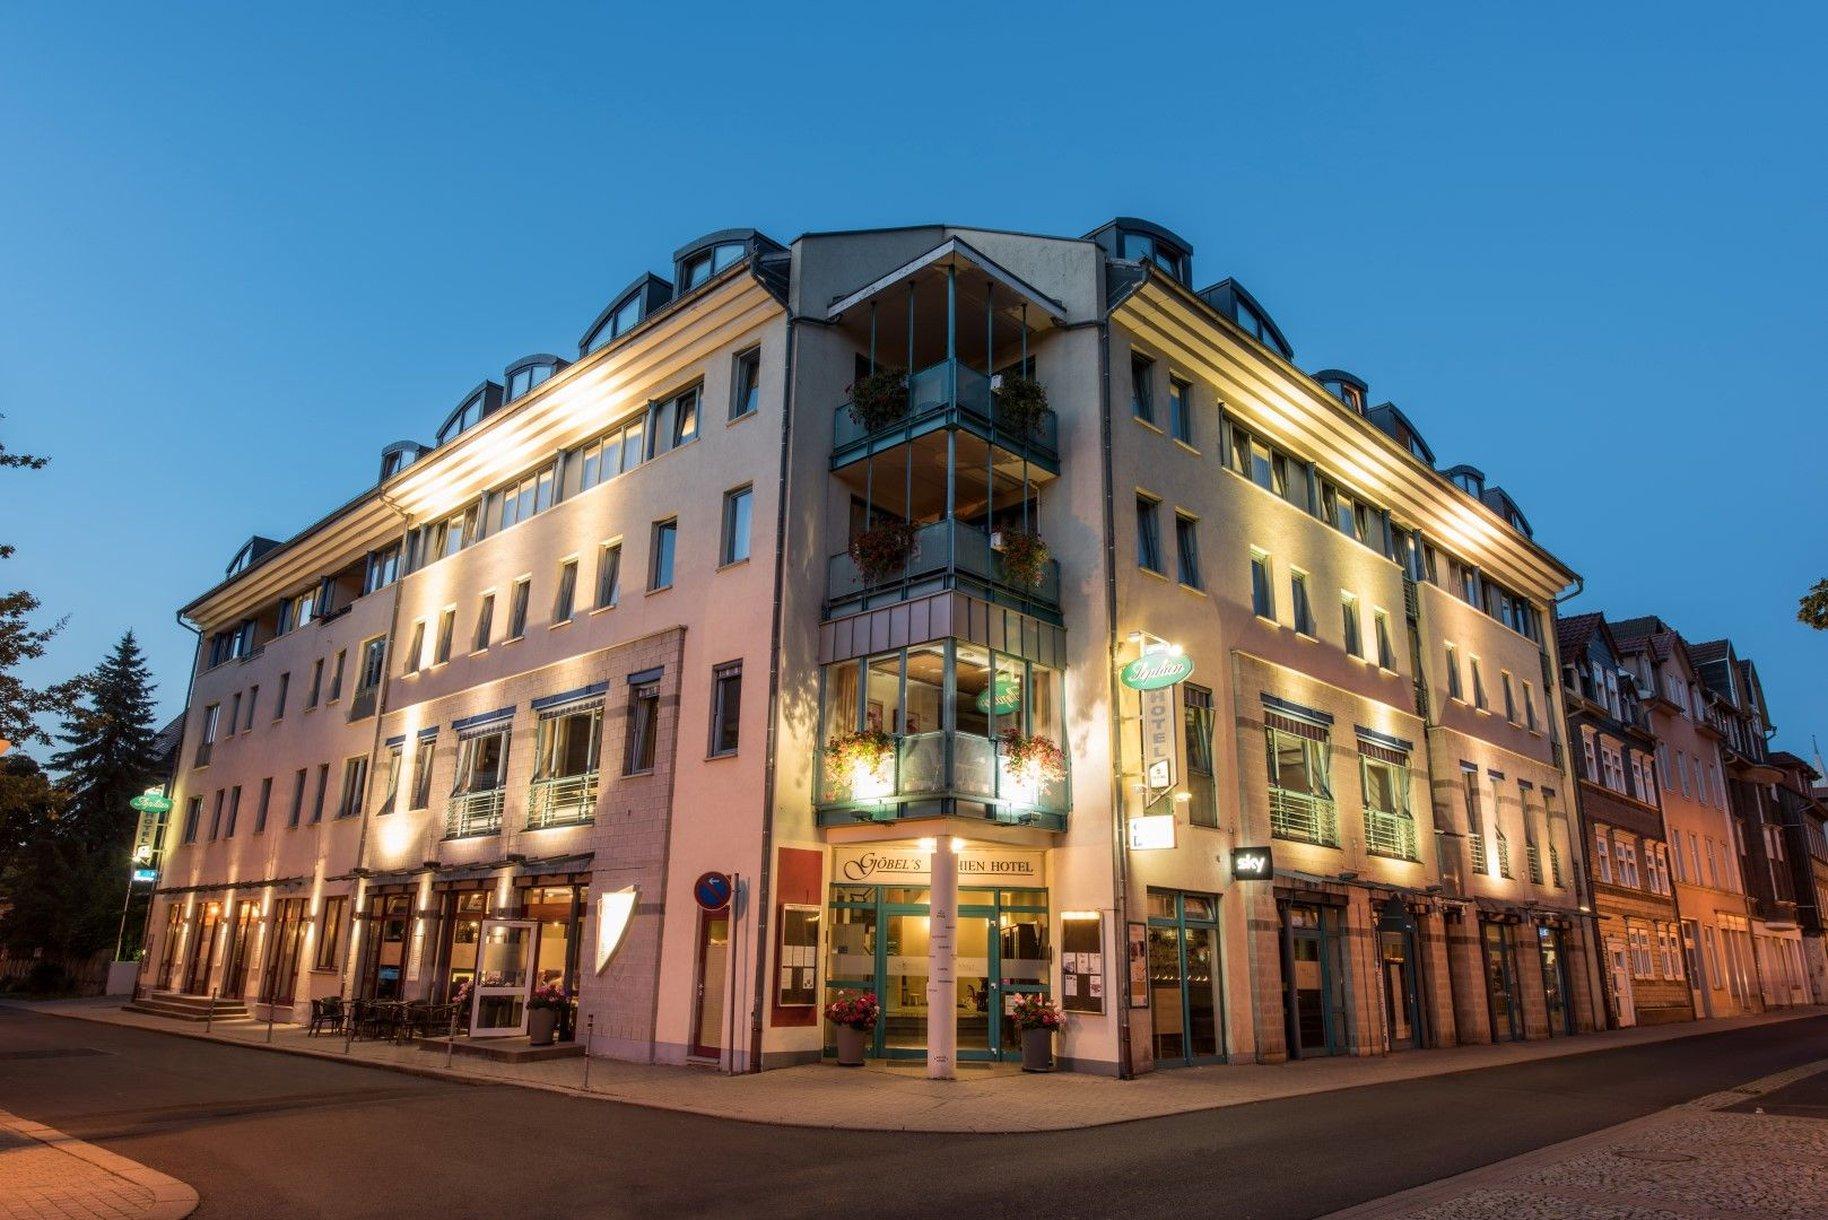 Gobel's Sophien Hotel